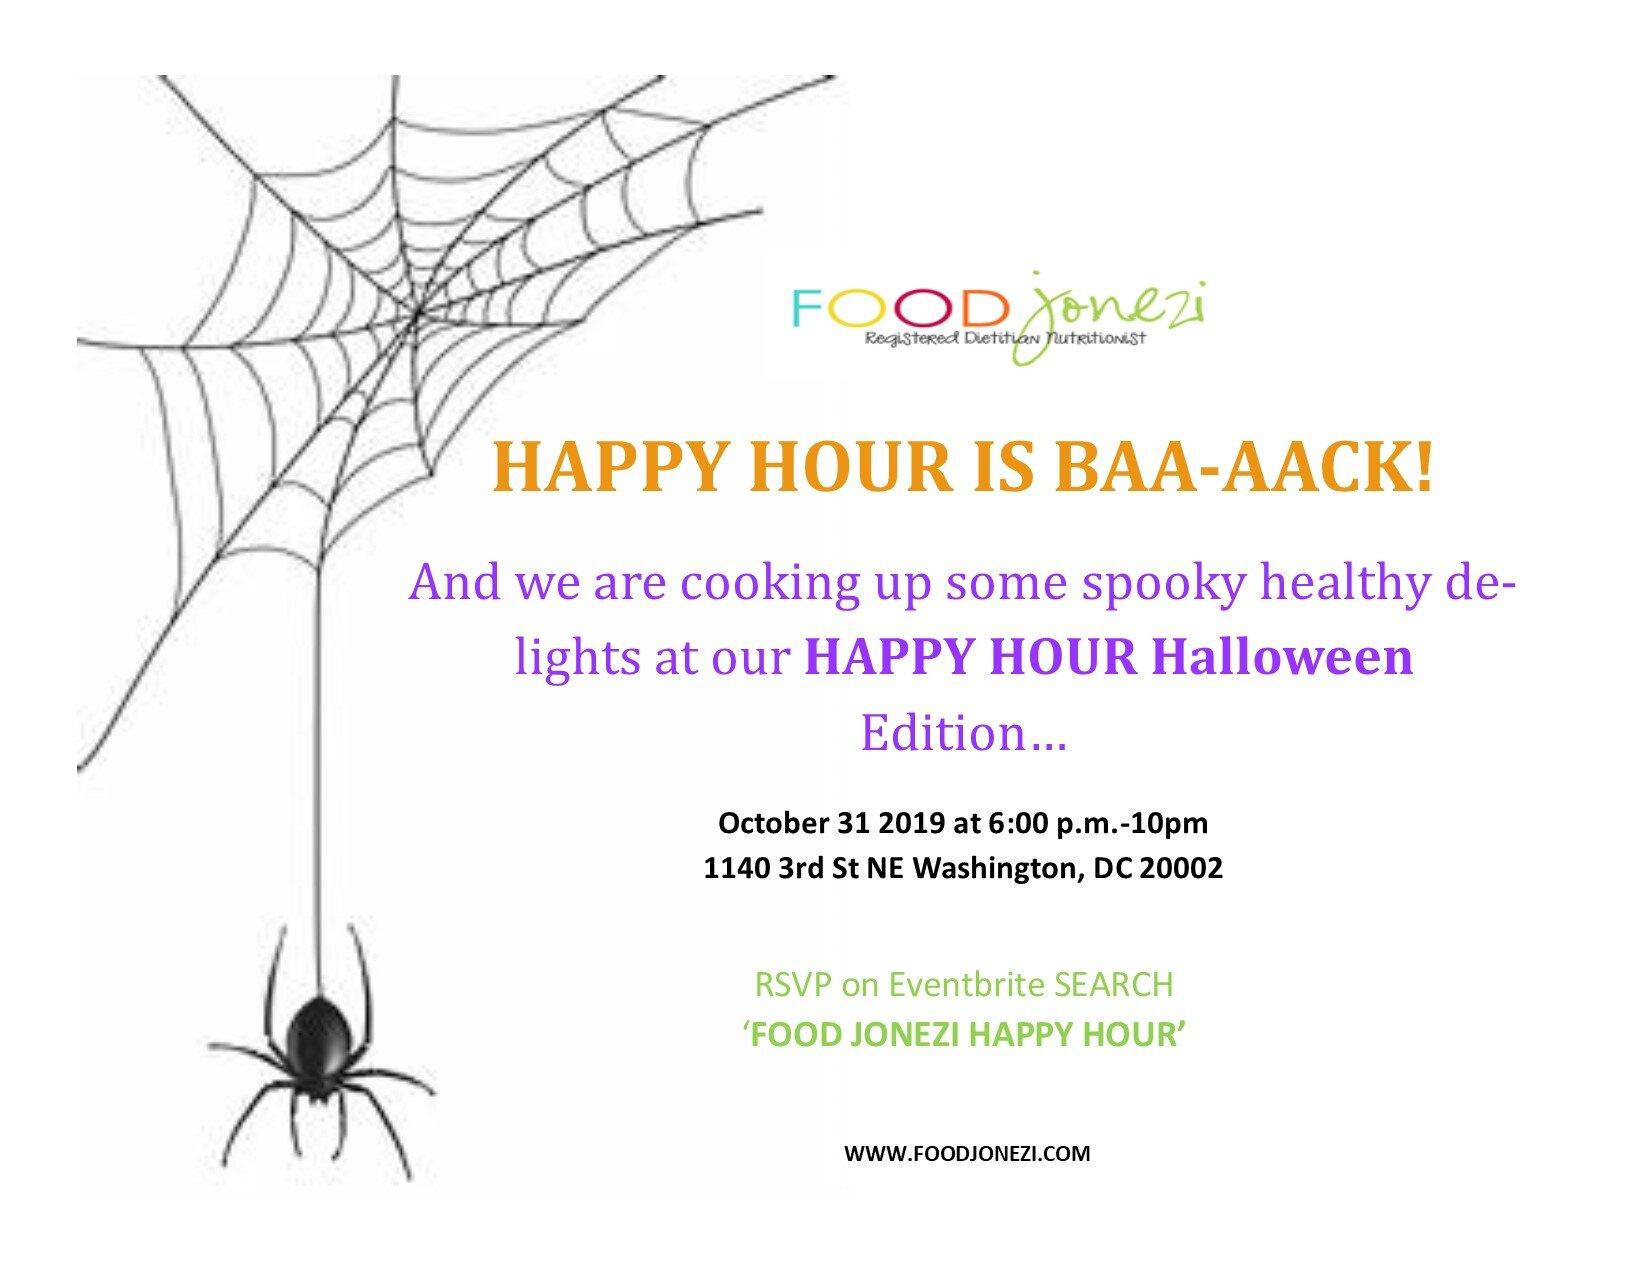 Food Jonezi-Halloween Happy Hour Flyer 4.jpg